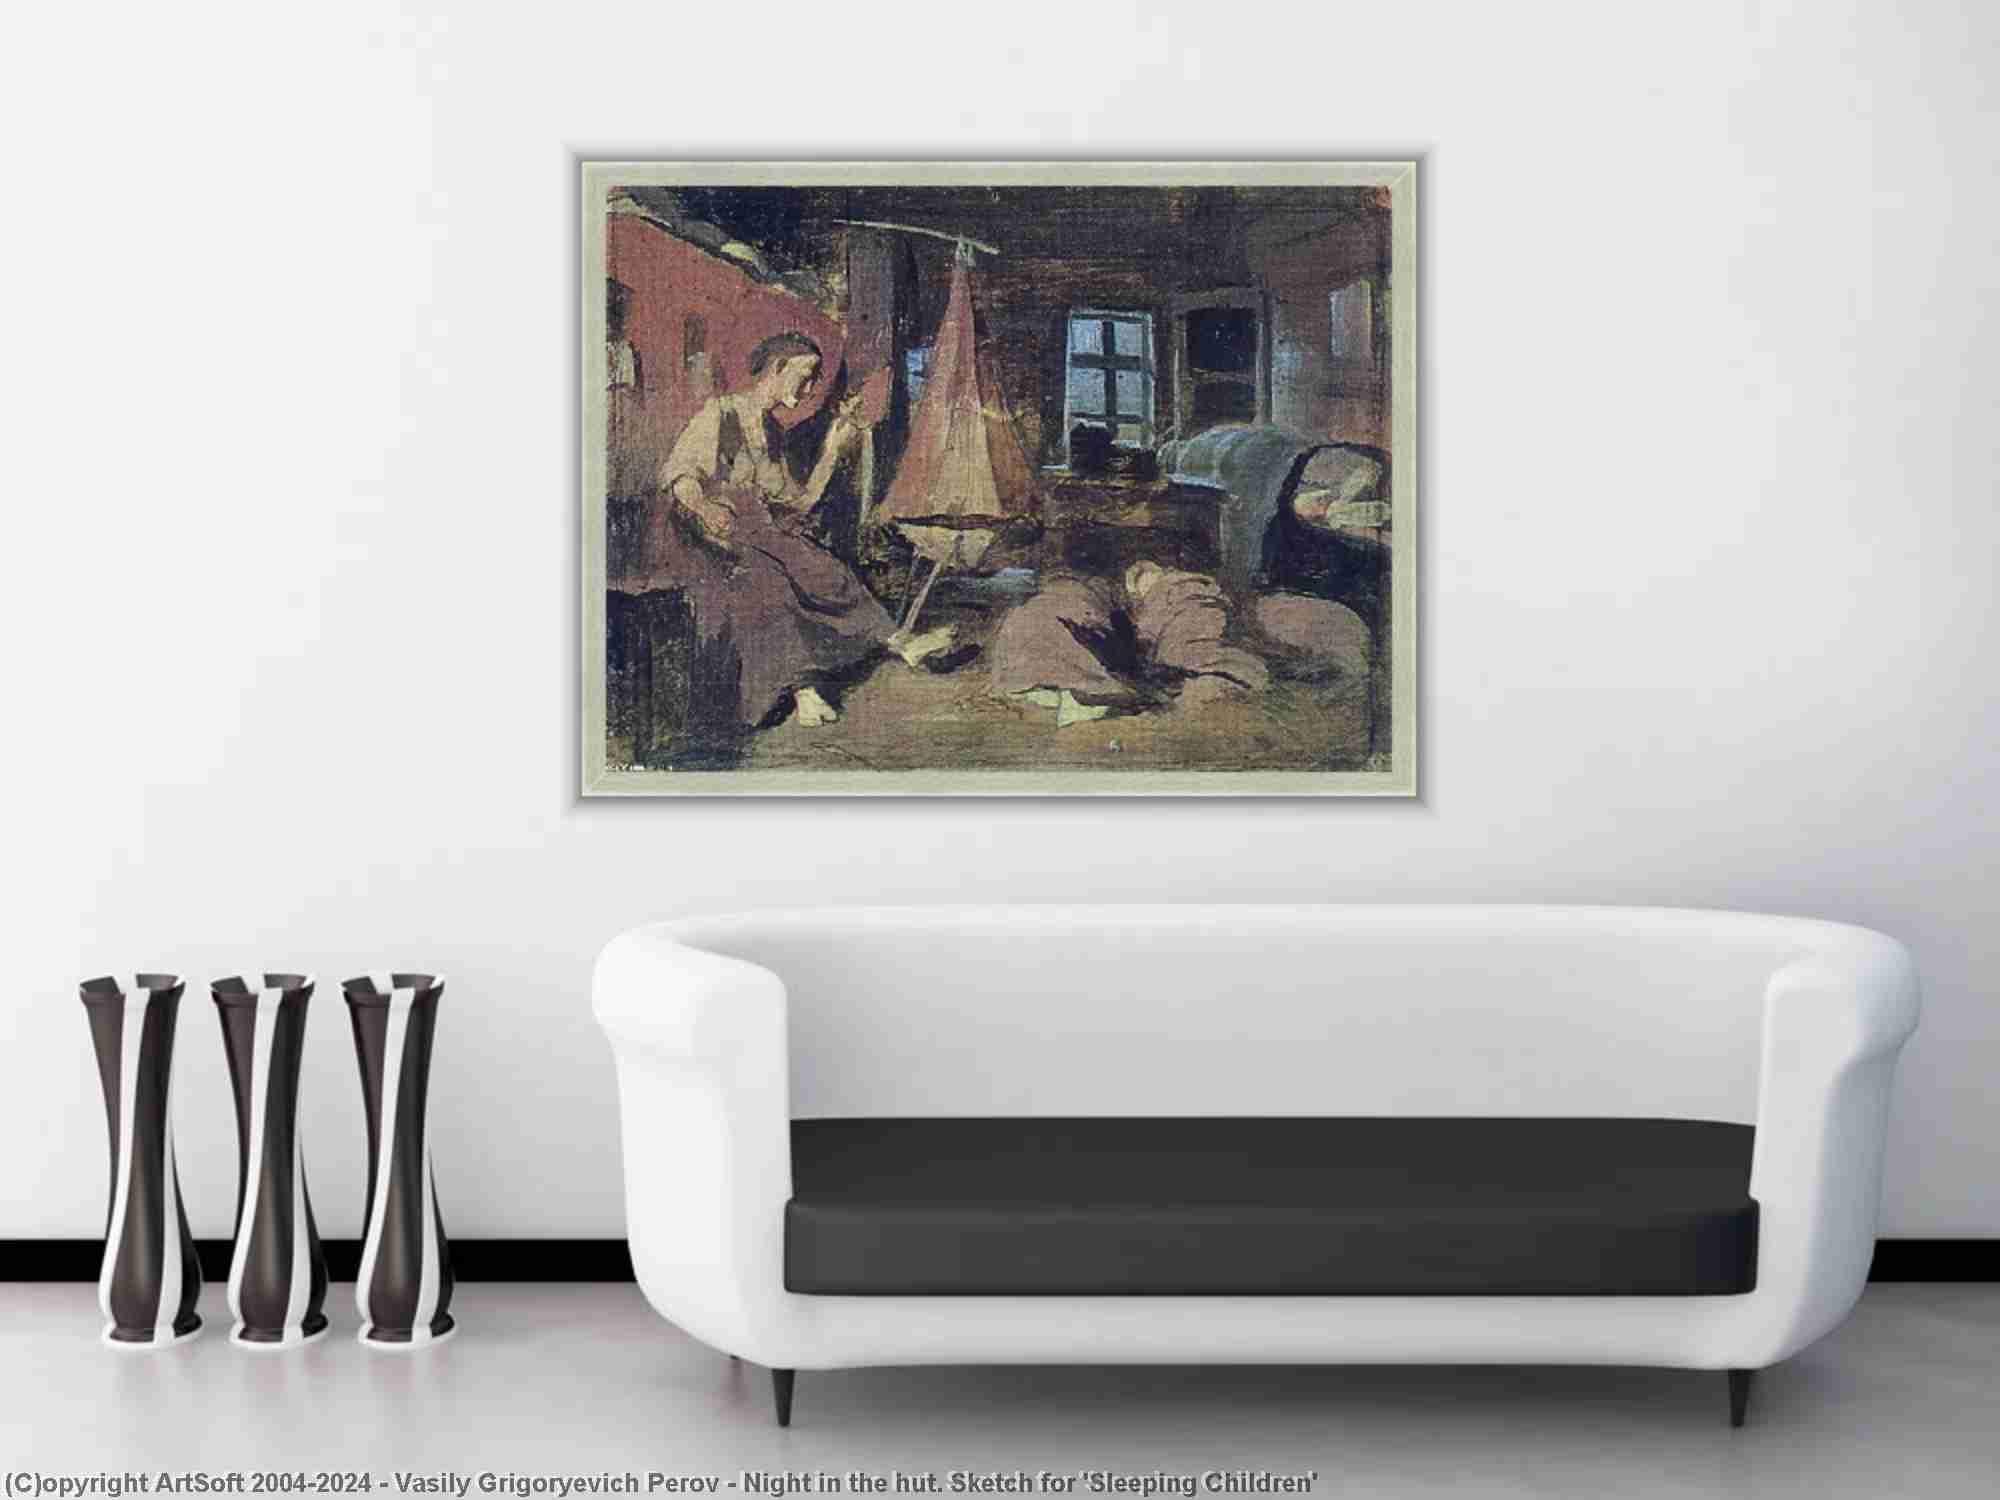 Vasily Grigoryevich Perov - Night in the hut. Sketch for -Sleeping Children-